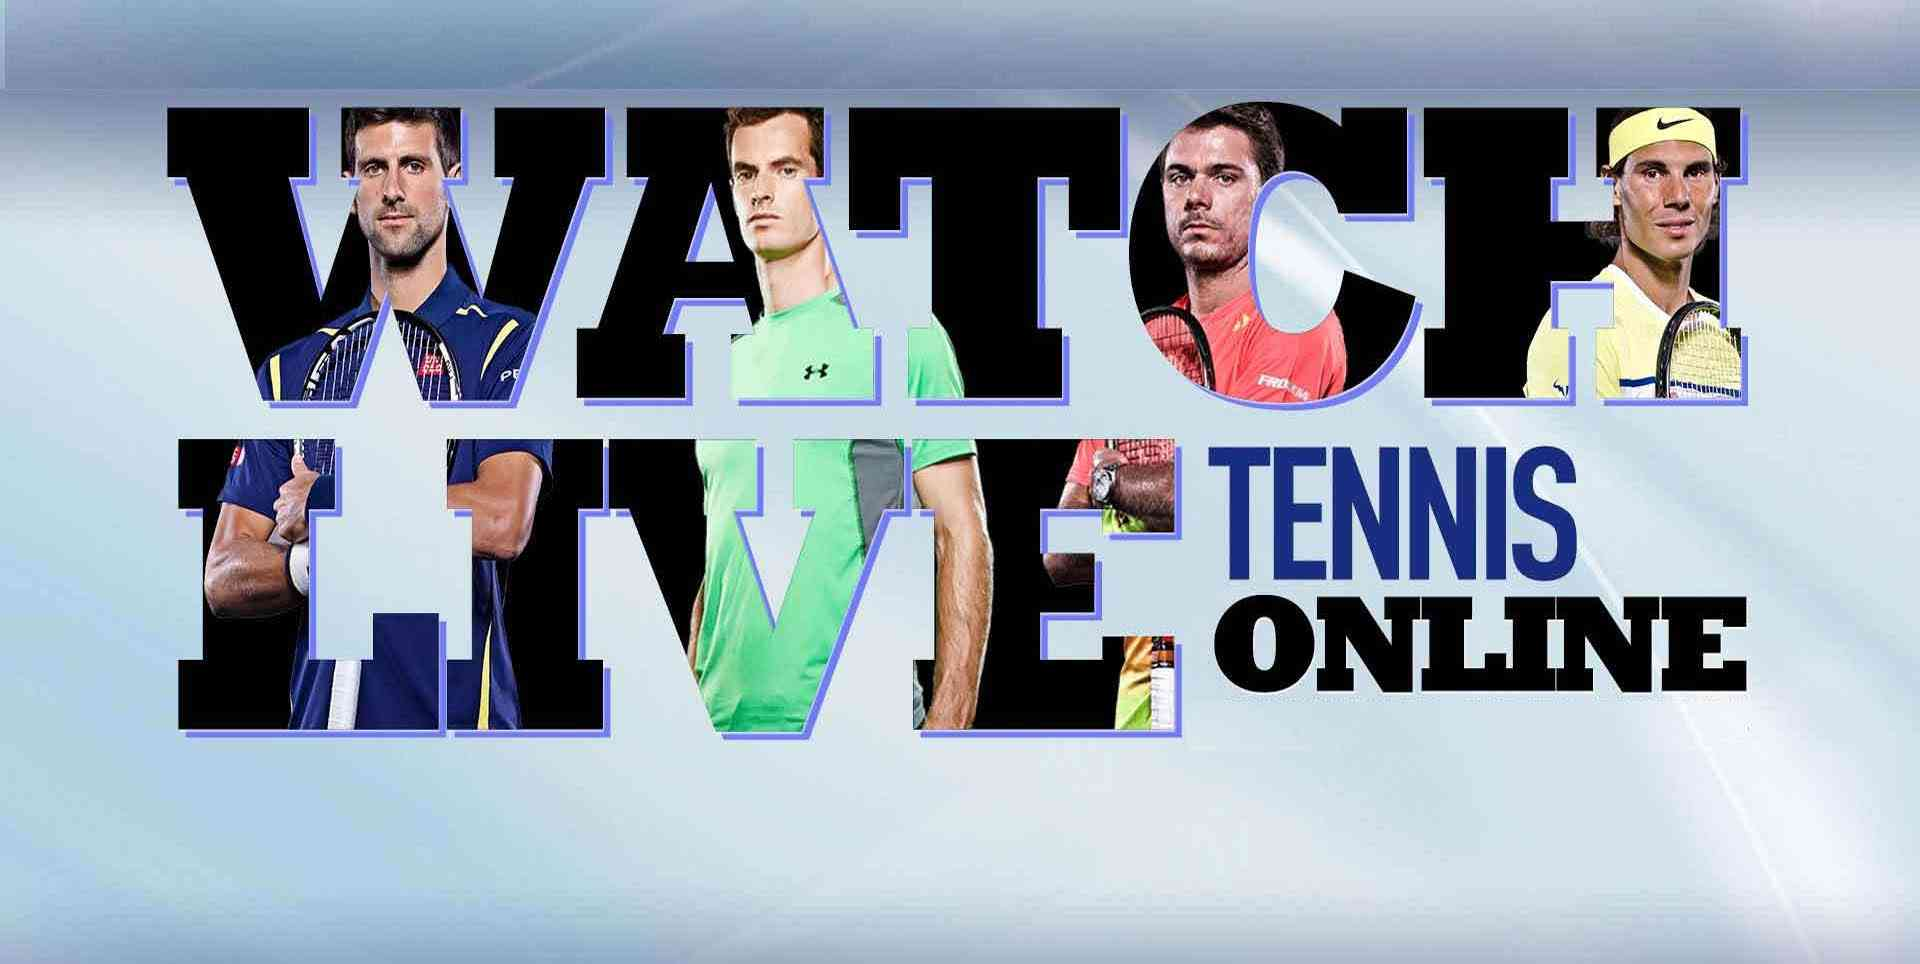 watch-a.-peya-|-b.-soares-vs-d.-marrero-|-f.-verdasco-quarterfinals-online-2013